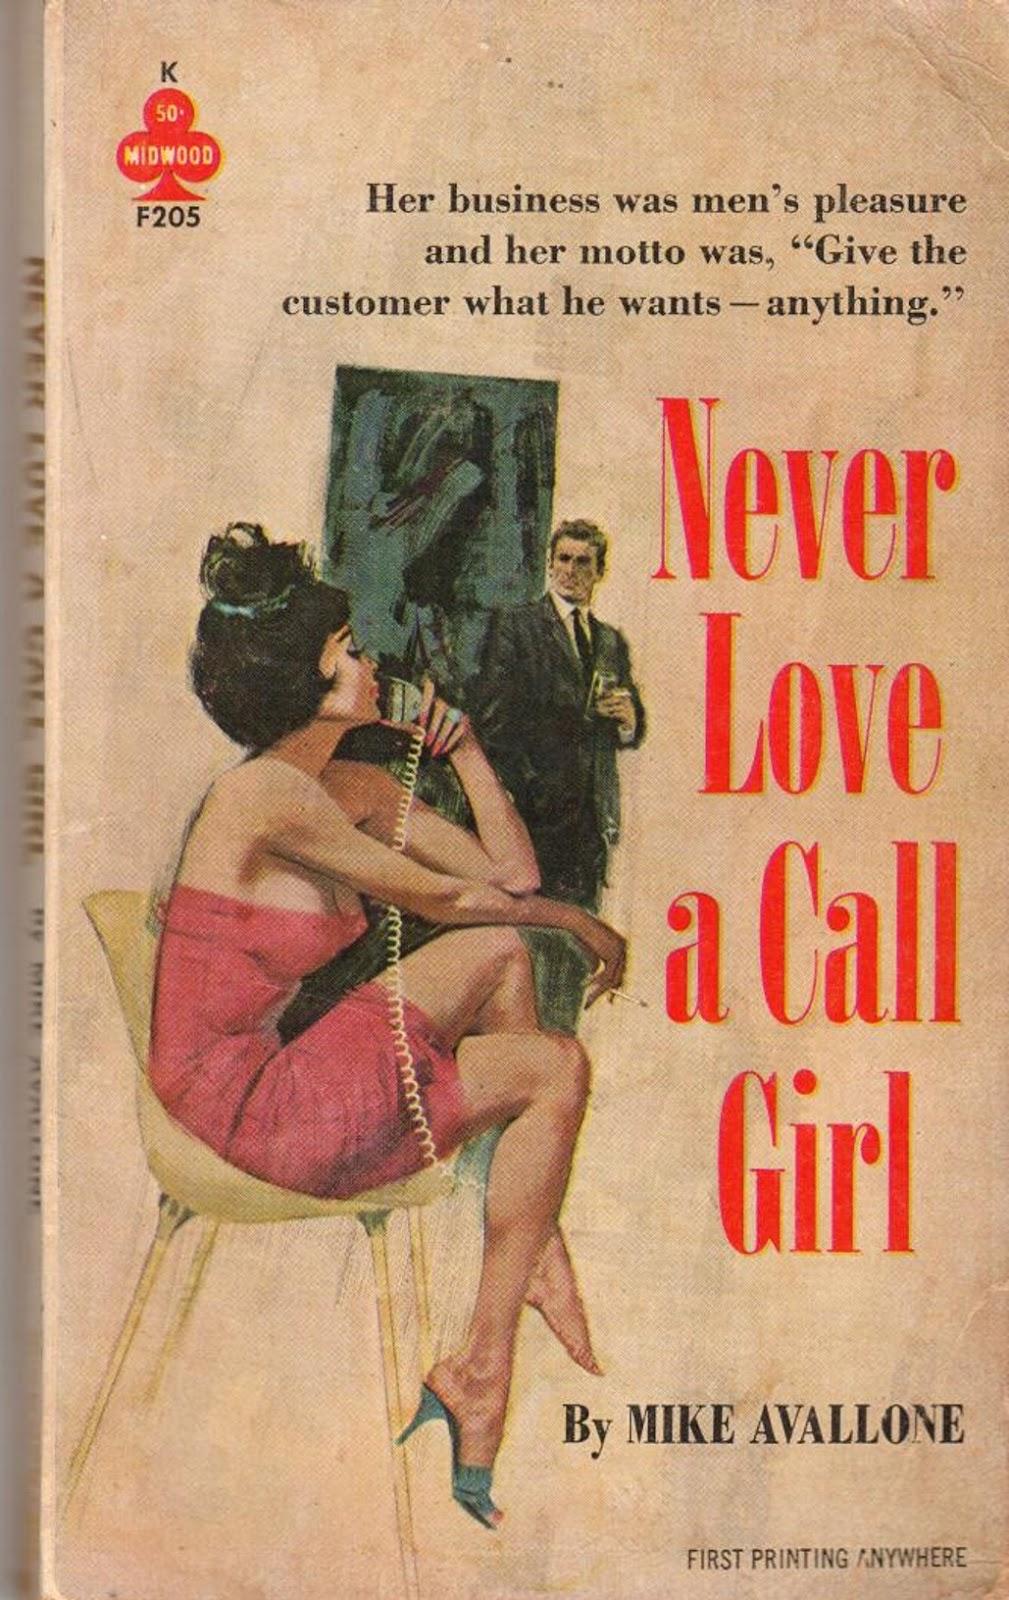 Call girl love